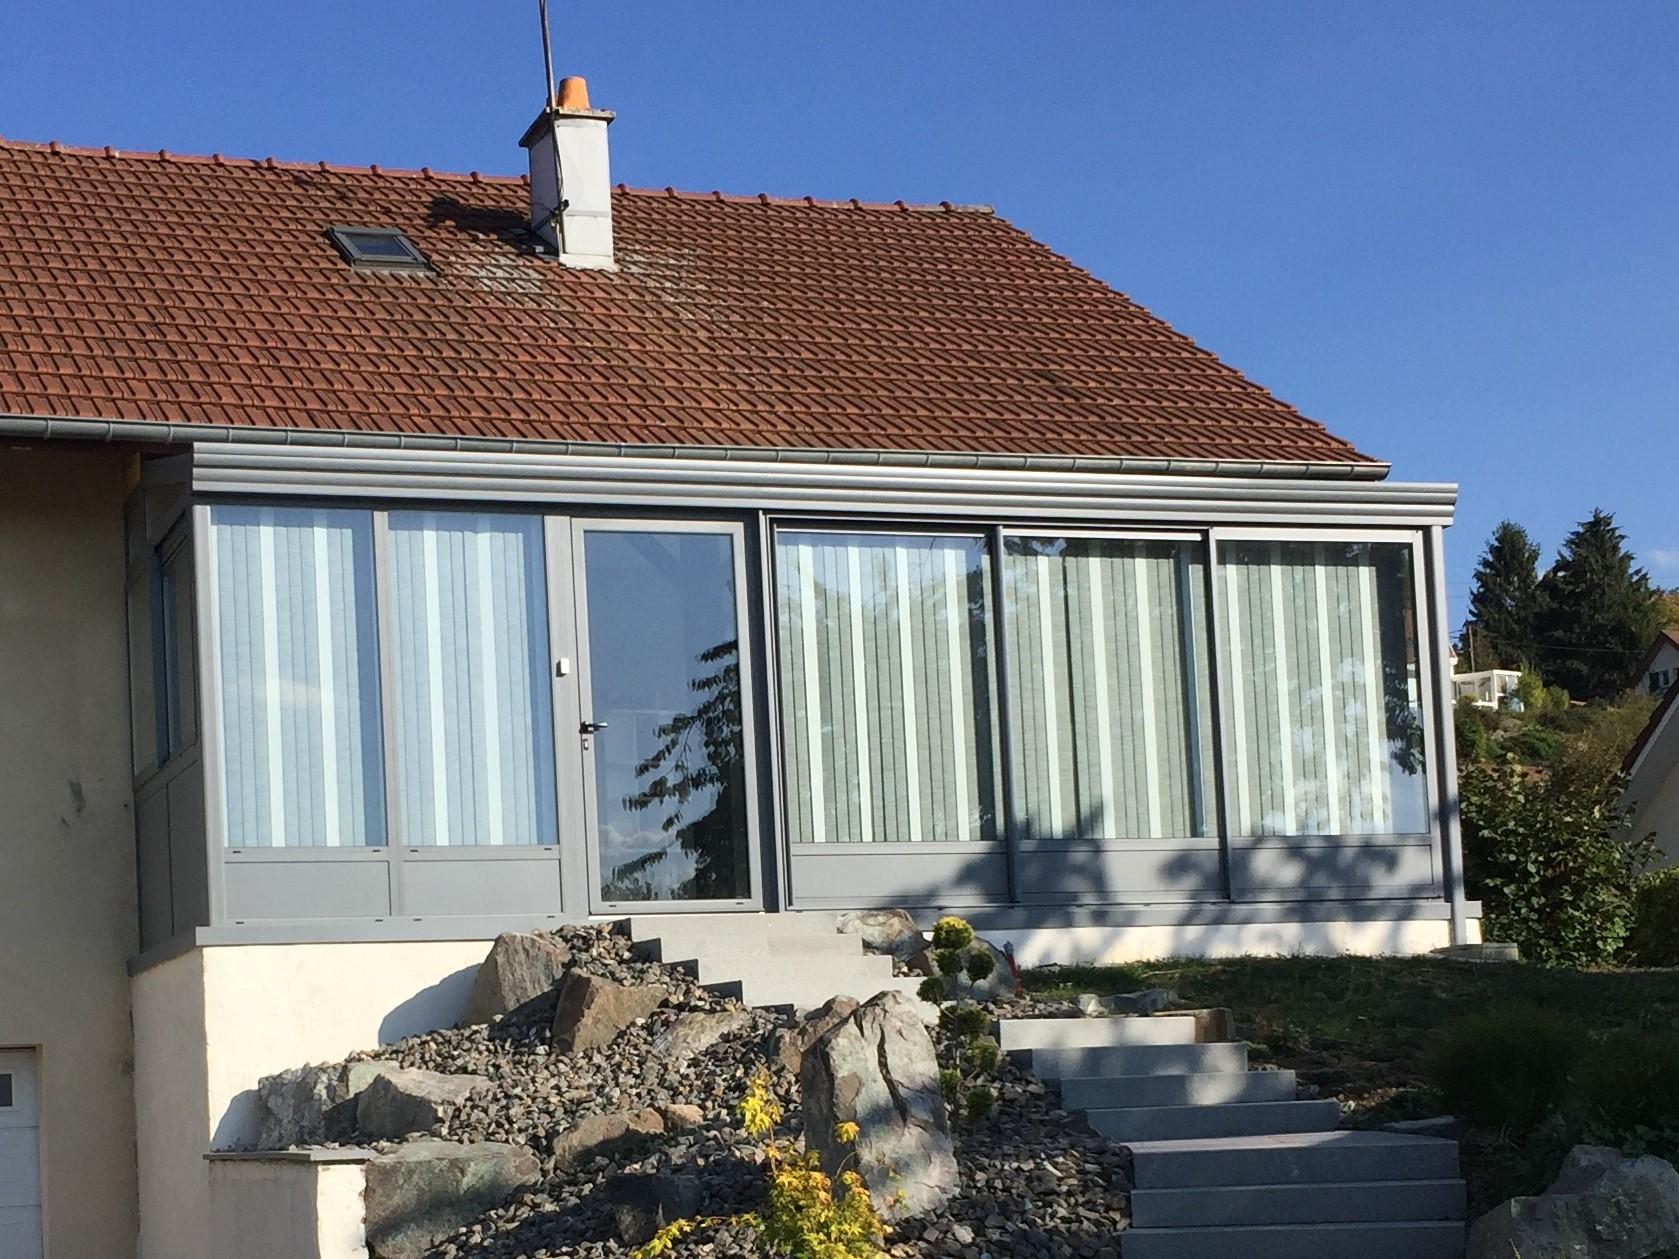 Véranda du Jura, pose véranda et extension maison Montbéliard, Belfort